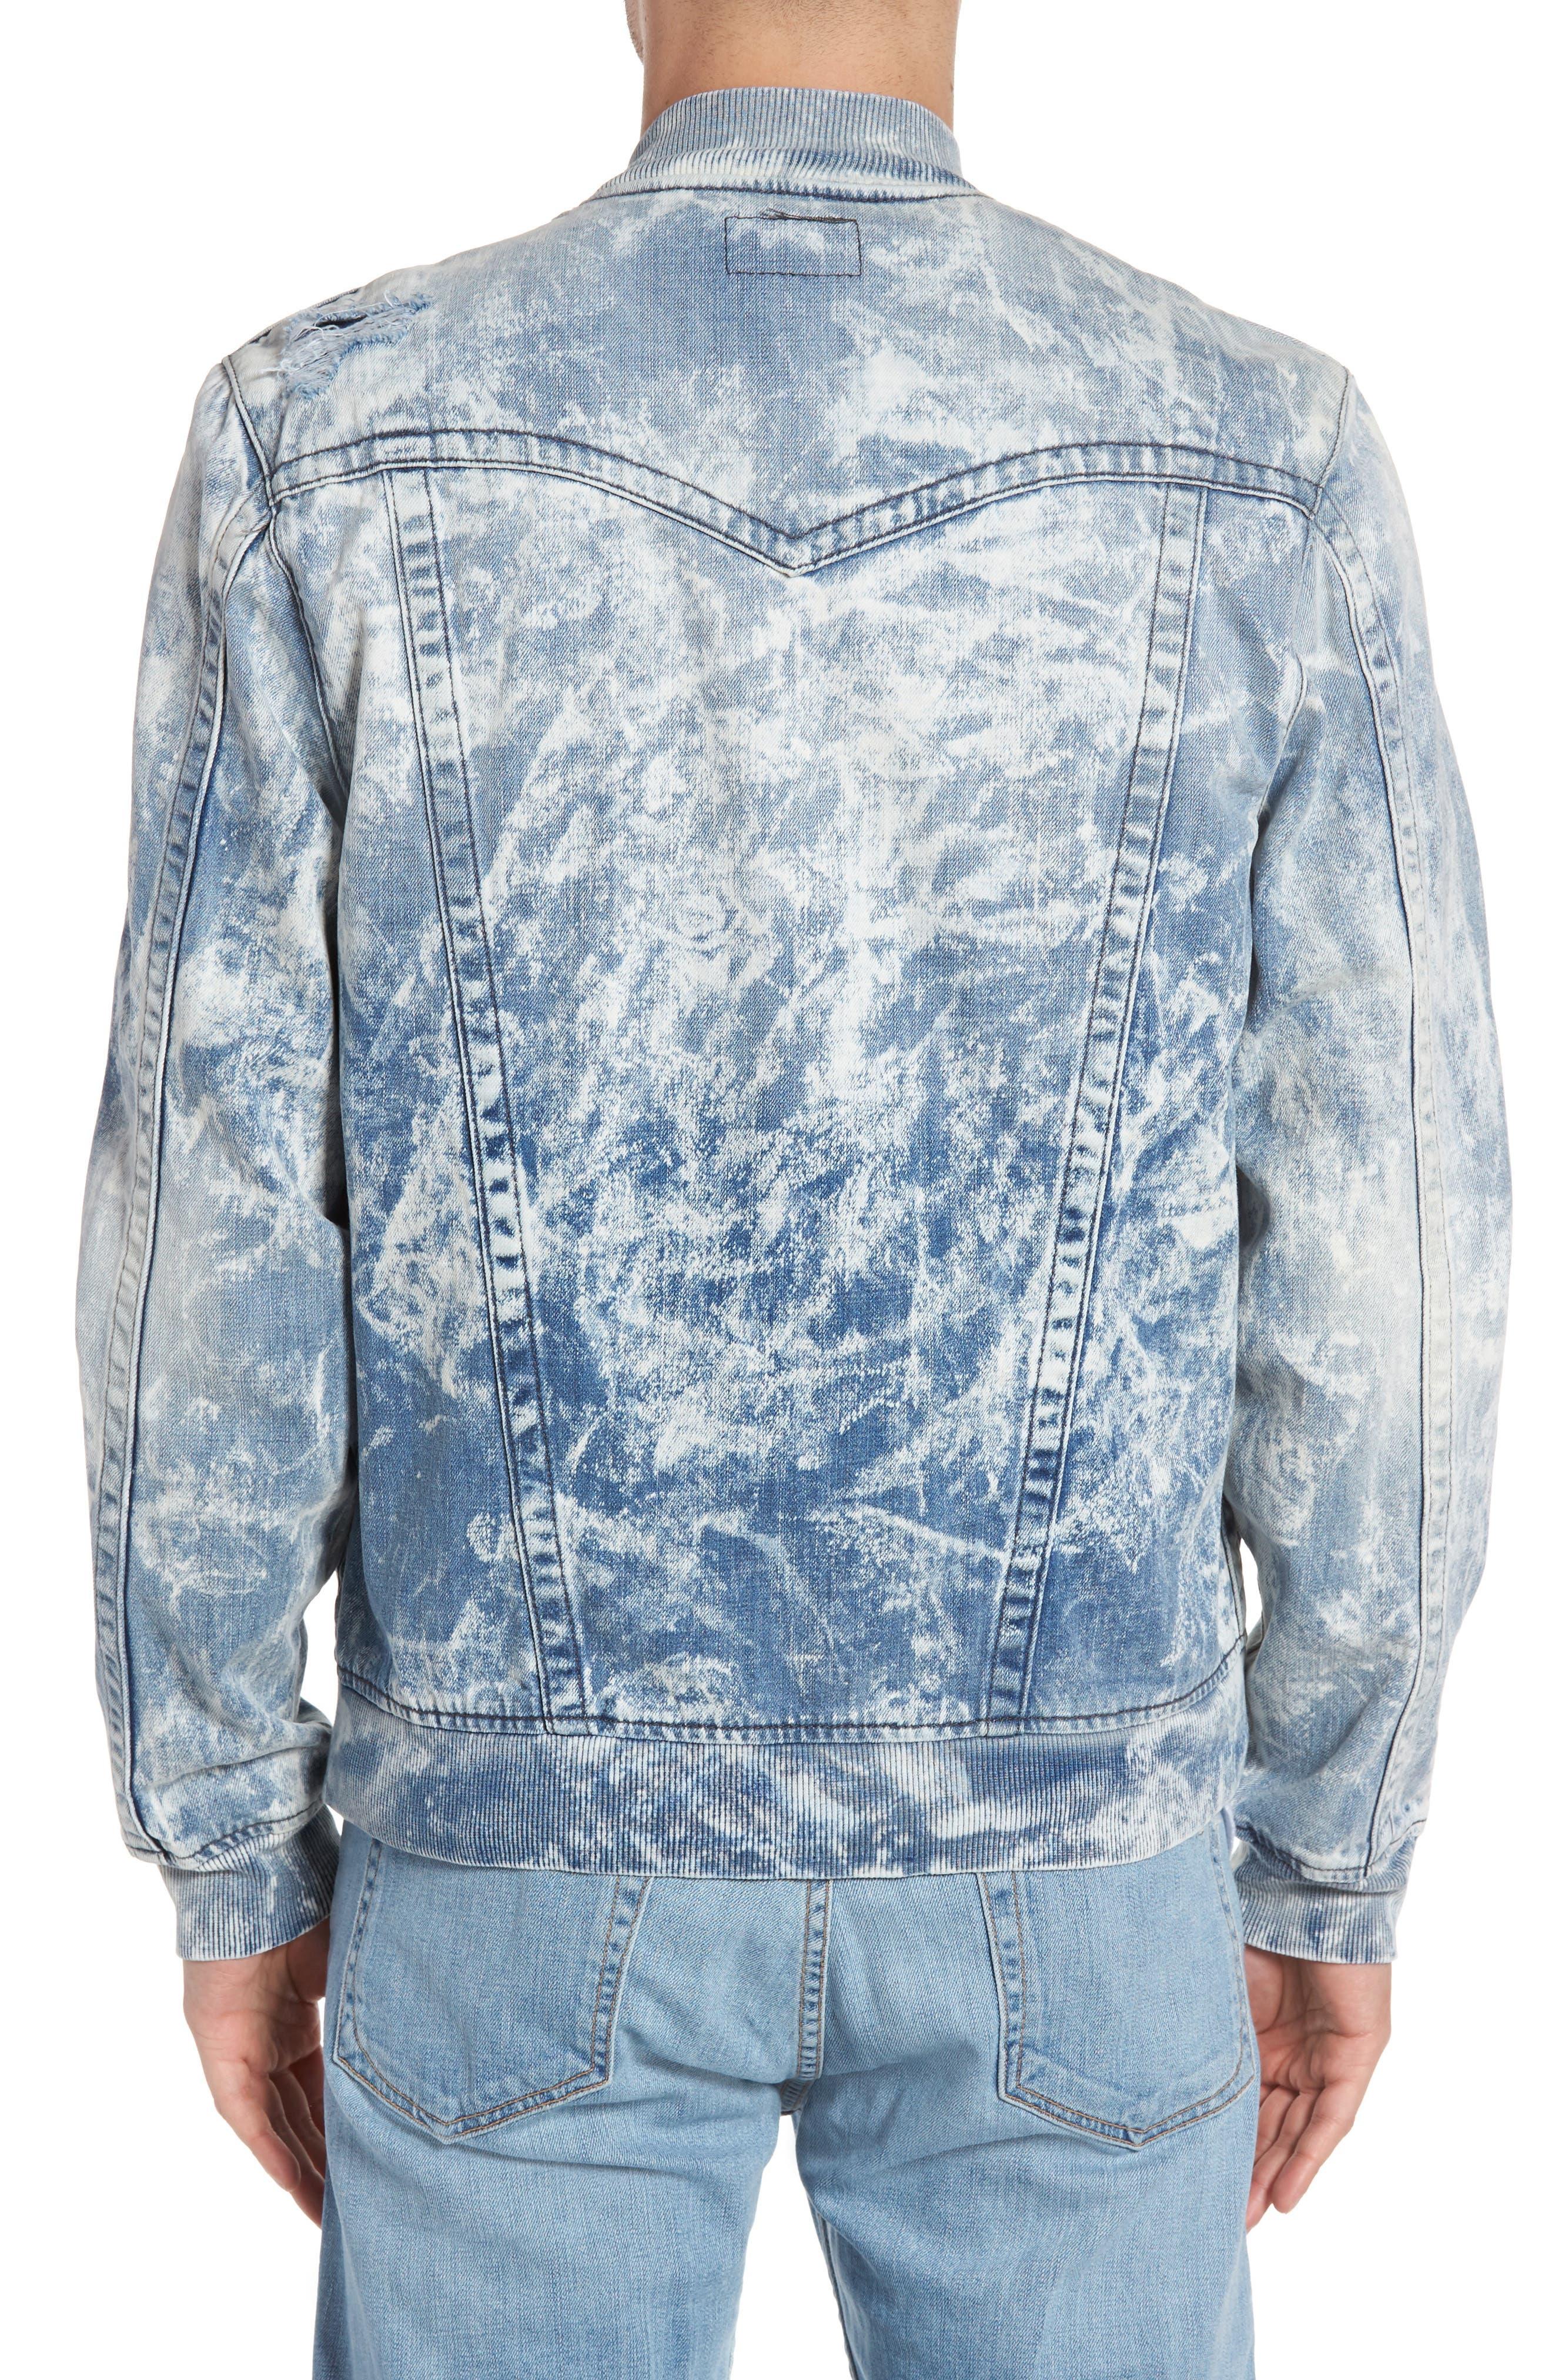 Alternate Image 2  - True Religion Brand Jeans Jimmy Bleached Denim Bomber Jacket